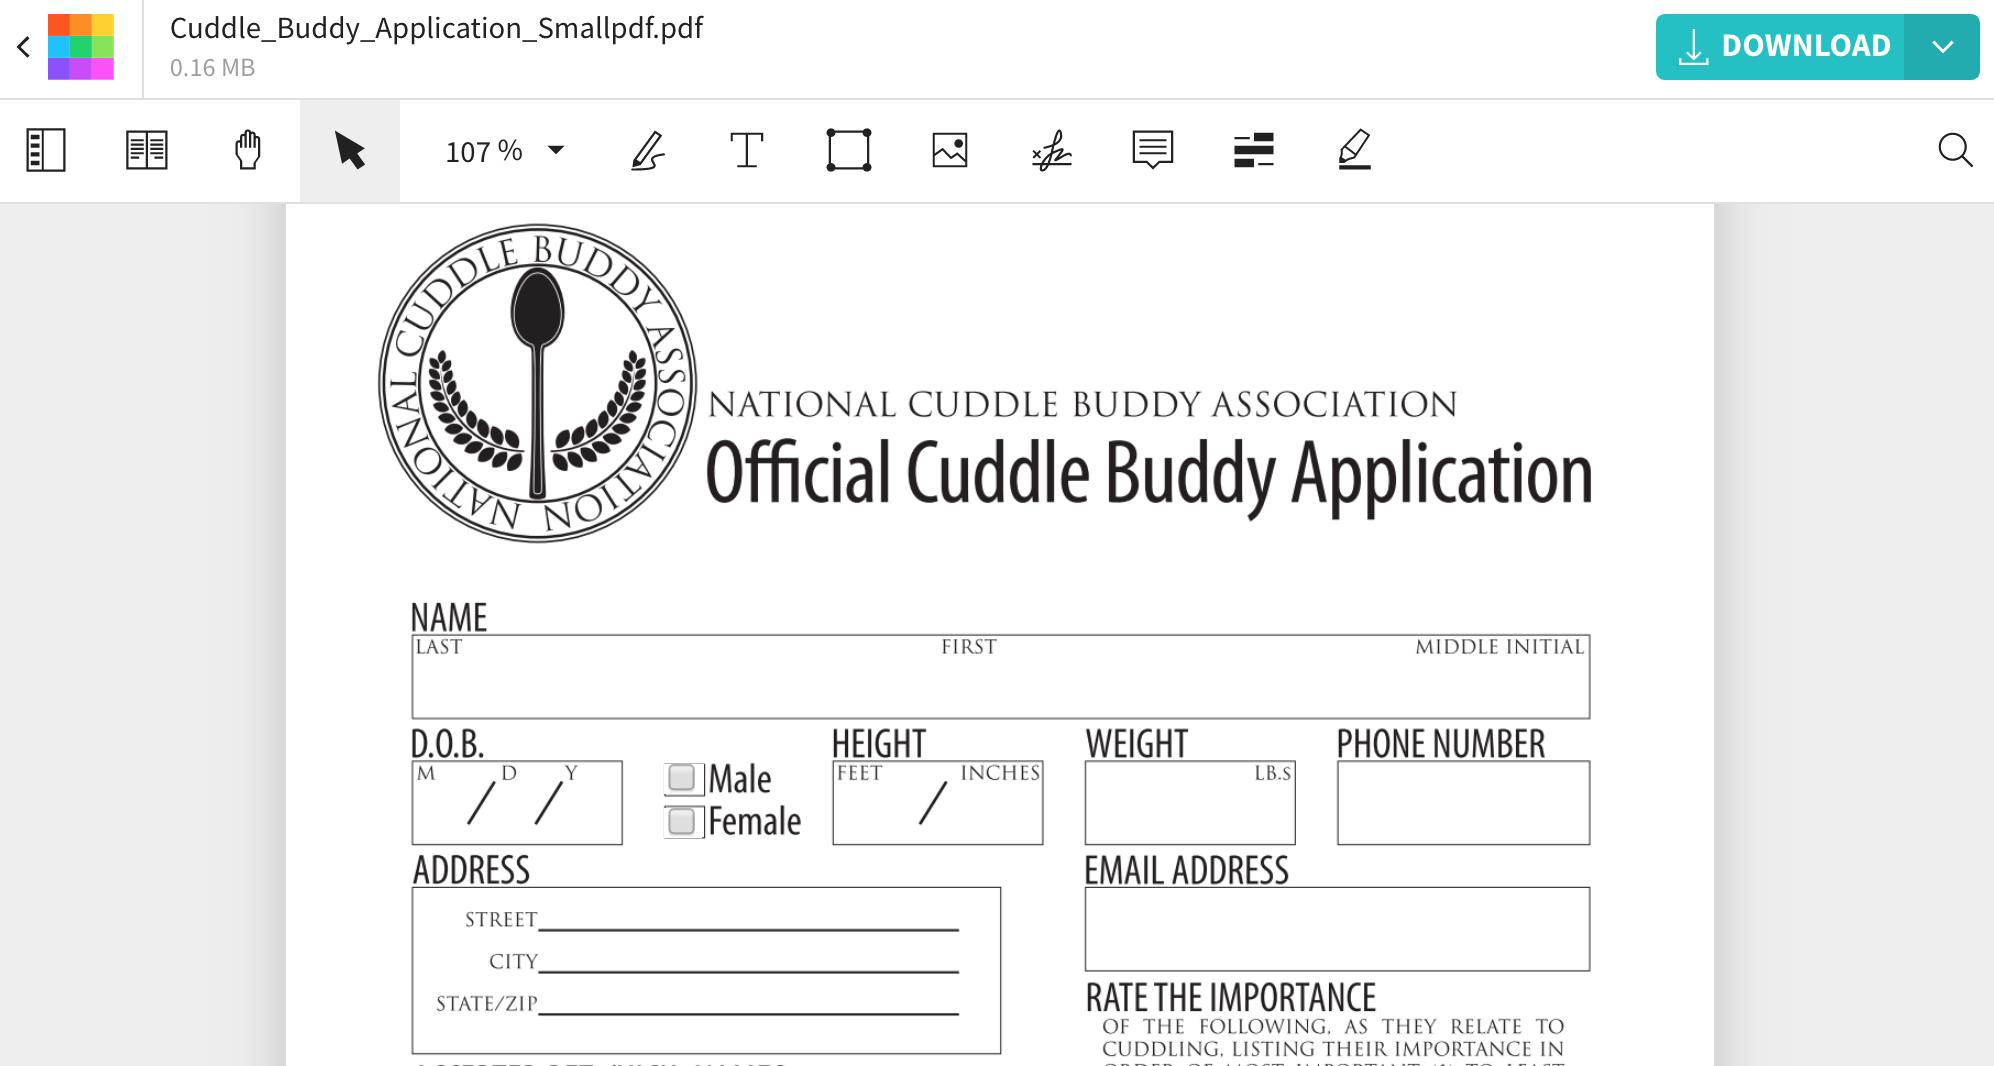 Online Cuddle Buddy Application Form   Smallpdf